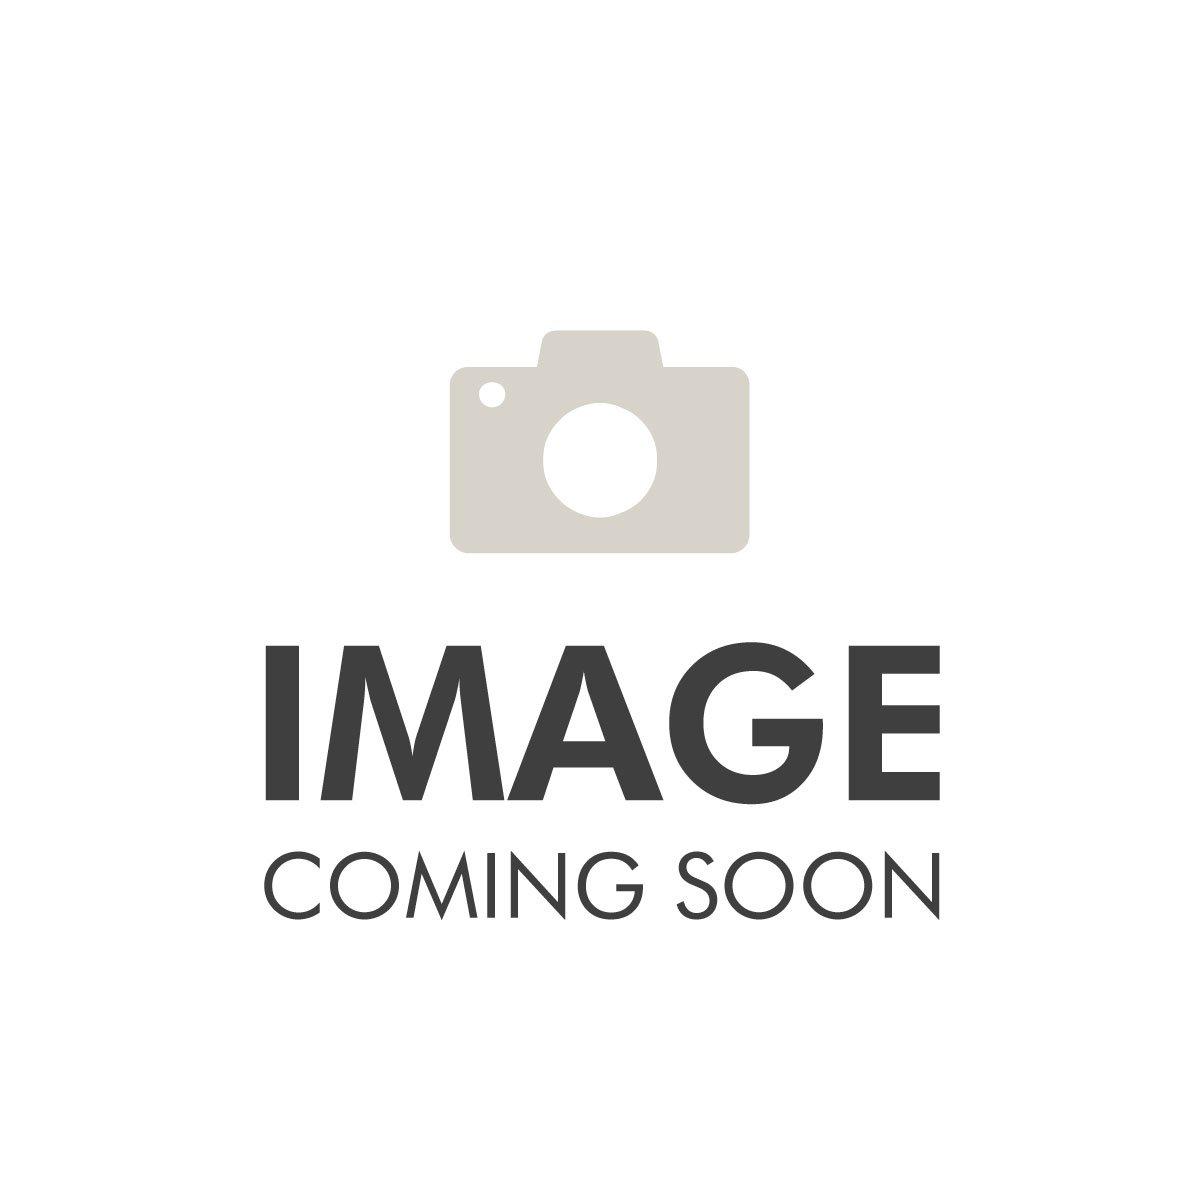 Thierry Mugler Angel Aqua Chic 50ml EDT Spray